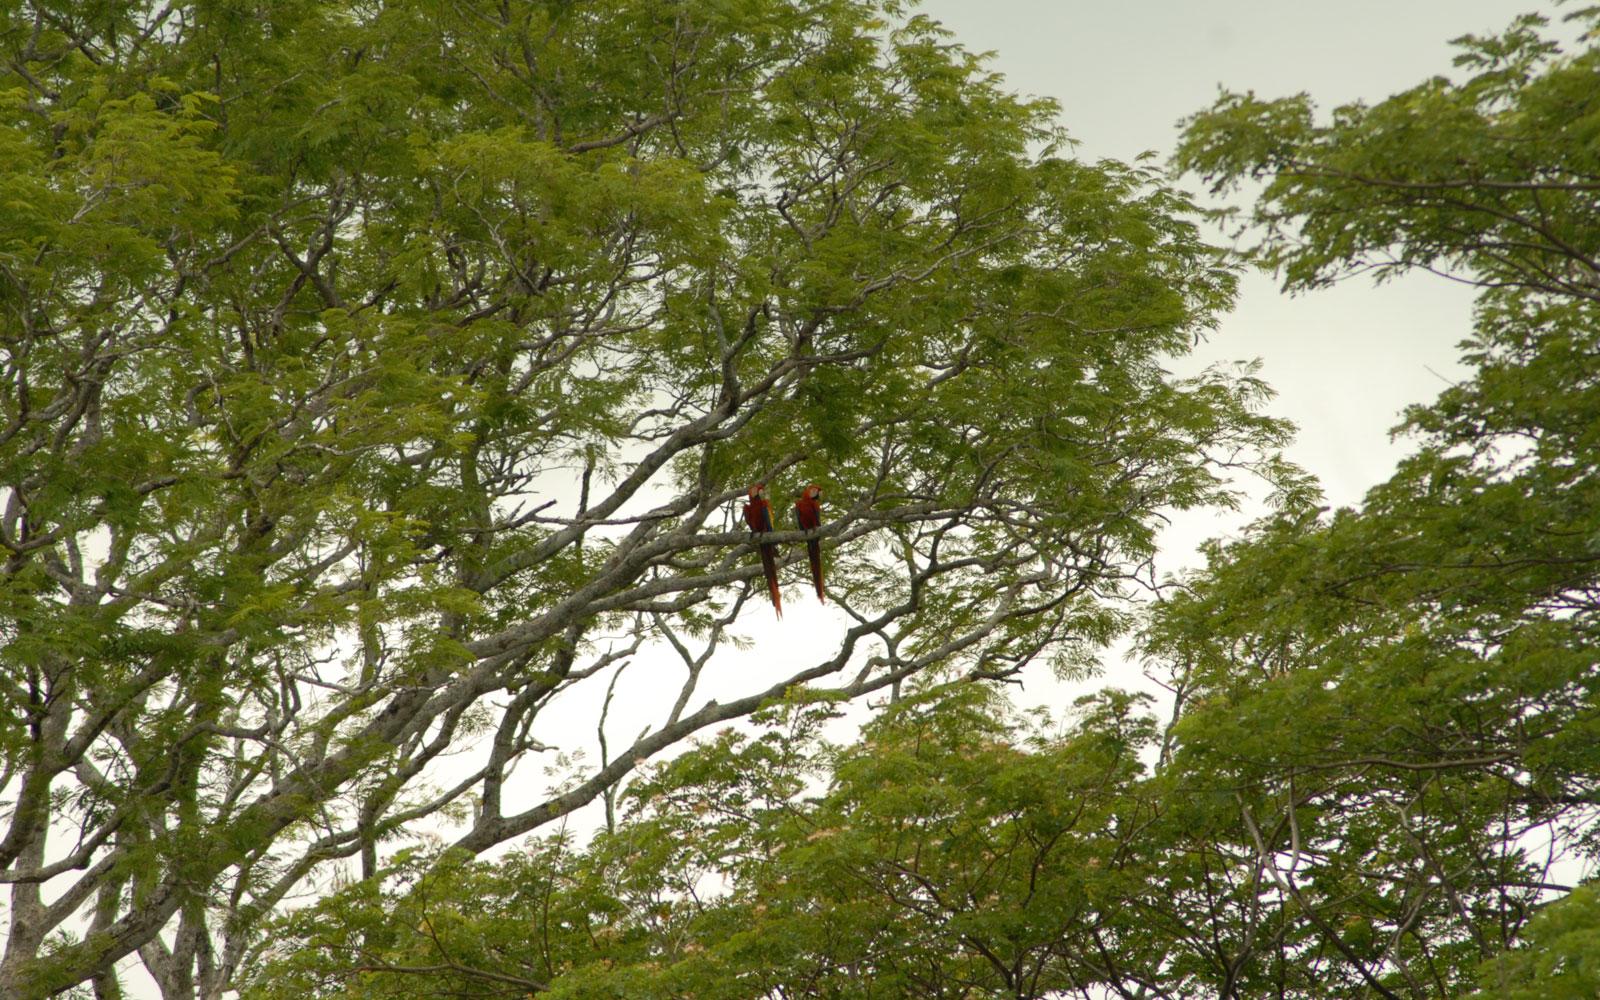 Enjoy Canopy tour nearby Costa Rica